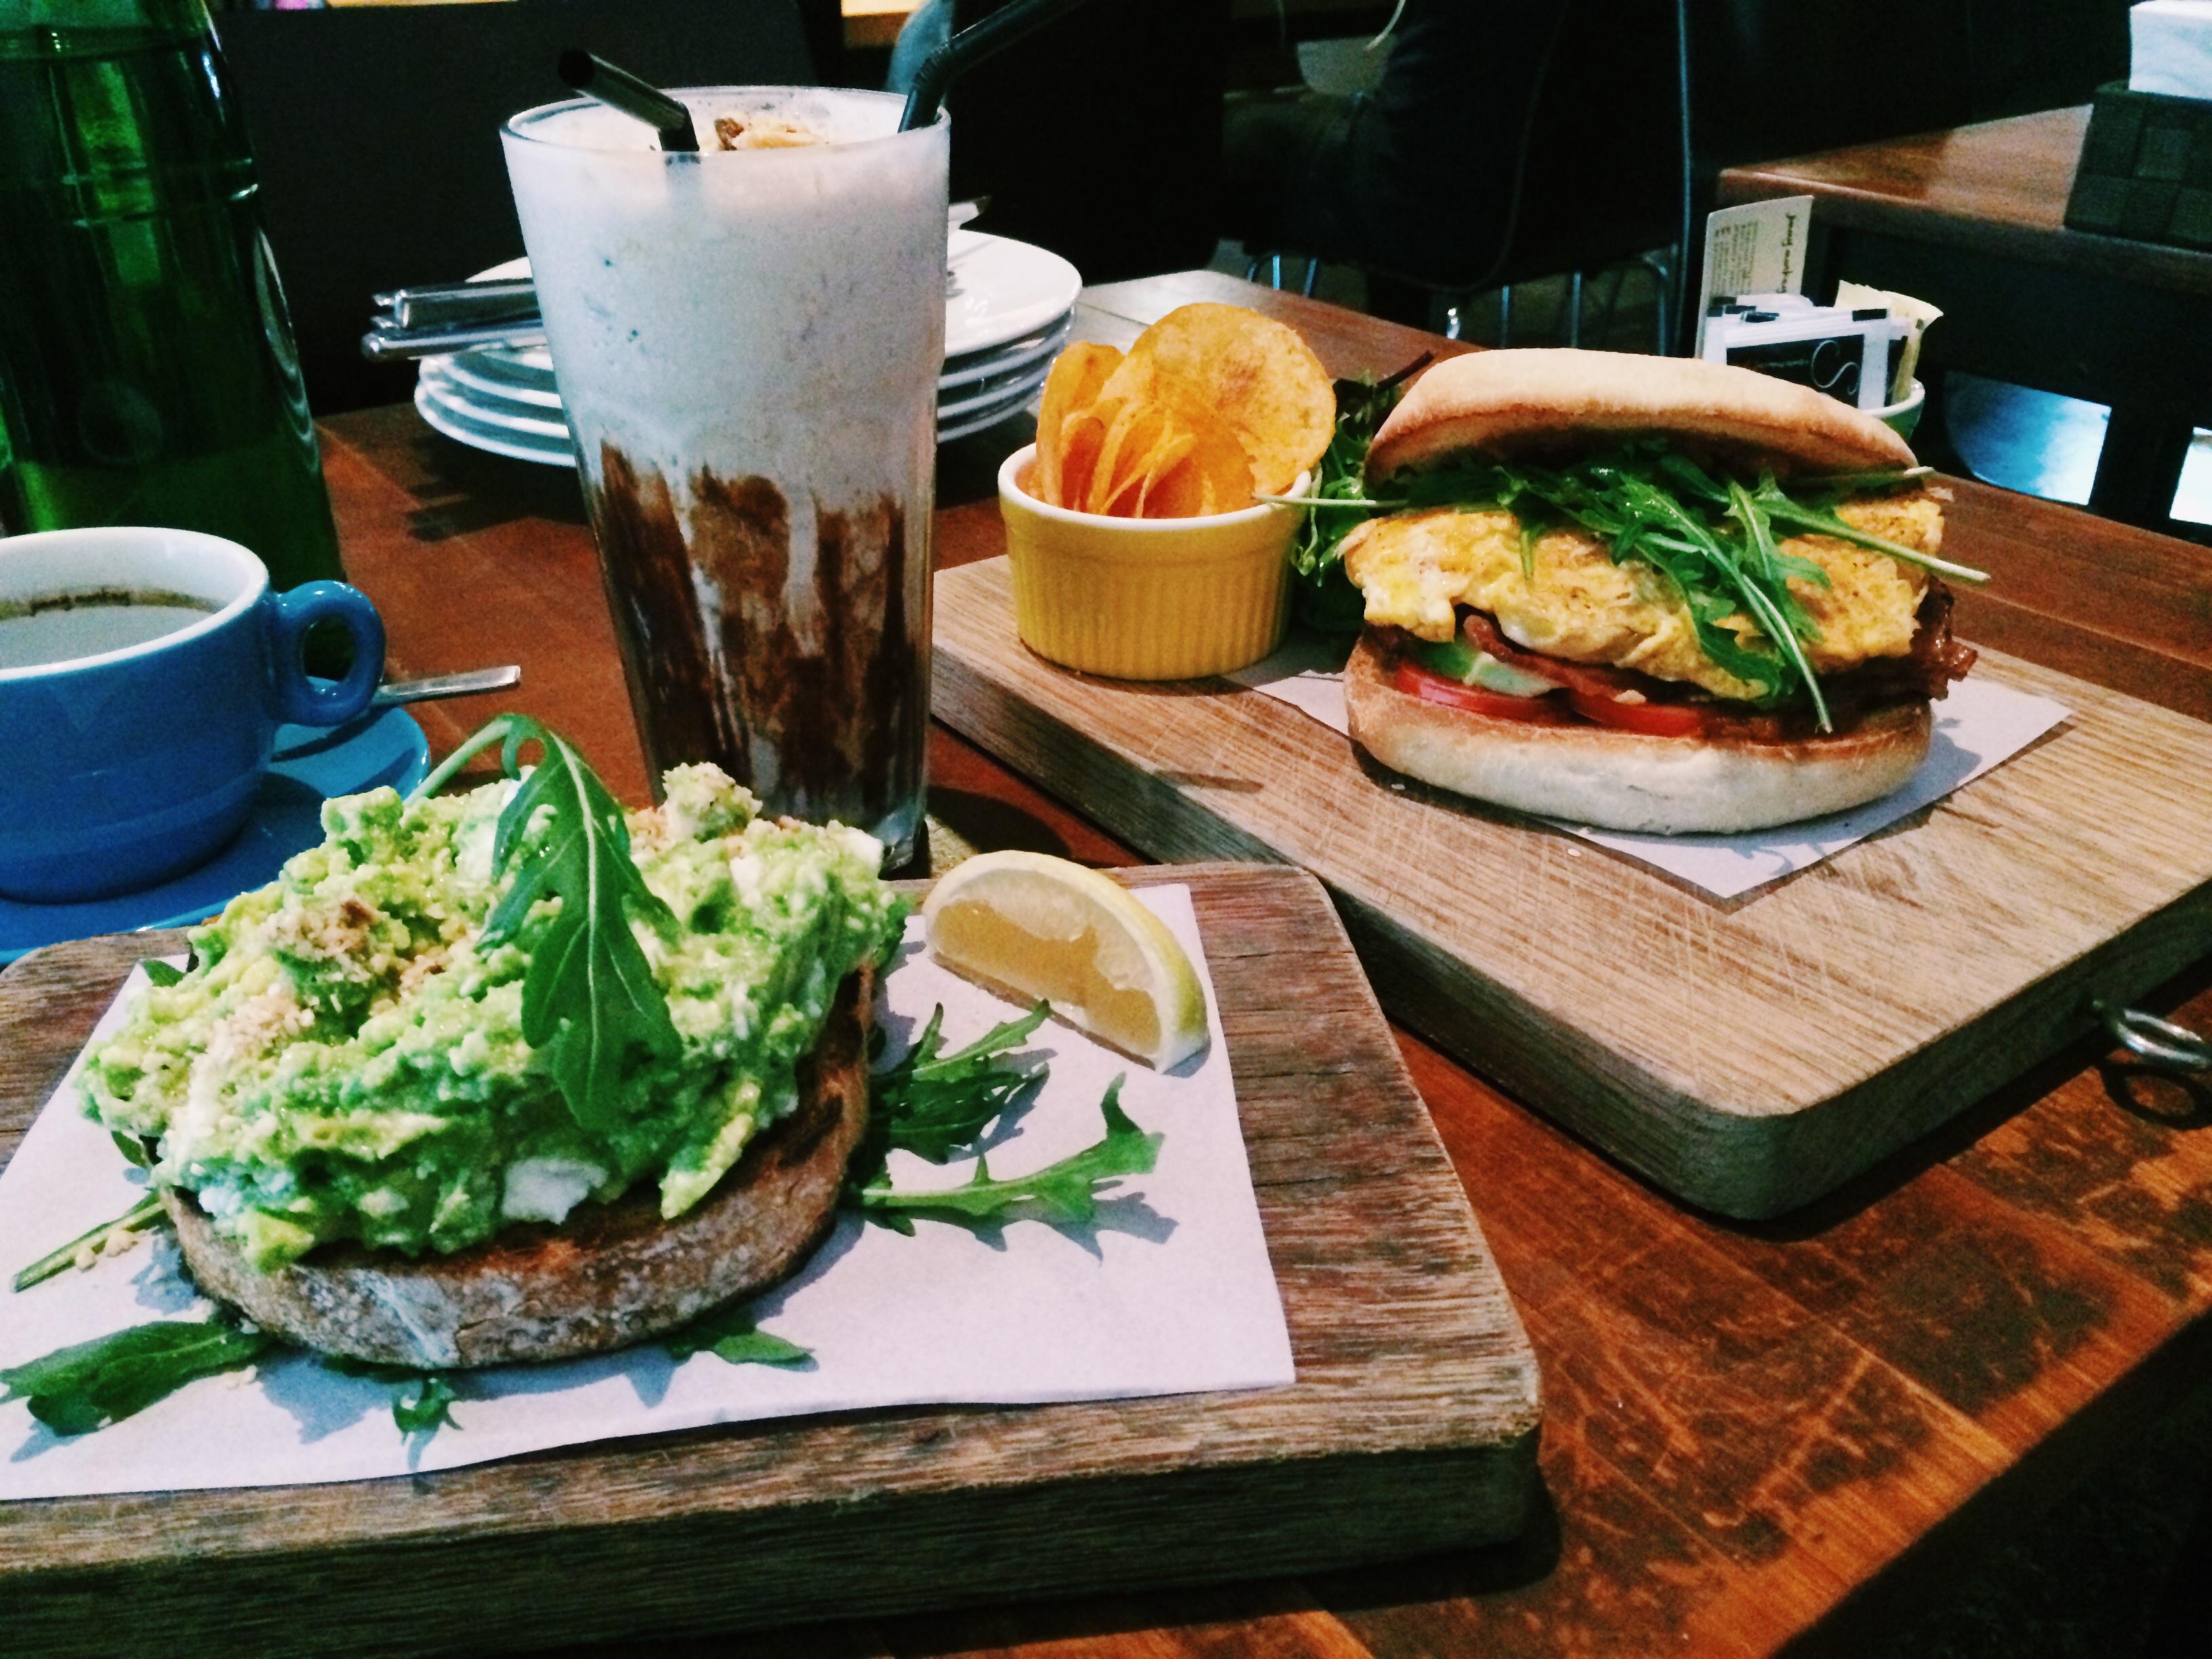 Jimmy monkey cafe and bar a taste of australian goodness for Australian cuisine singapore